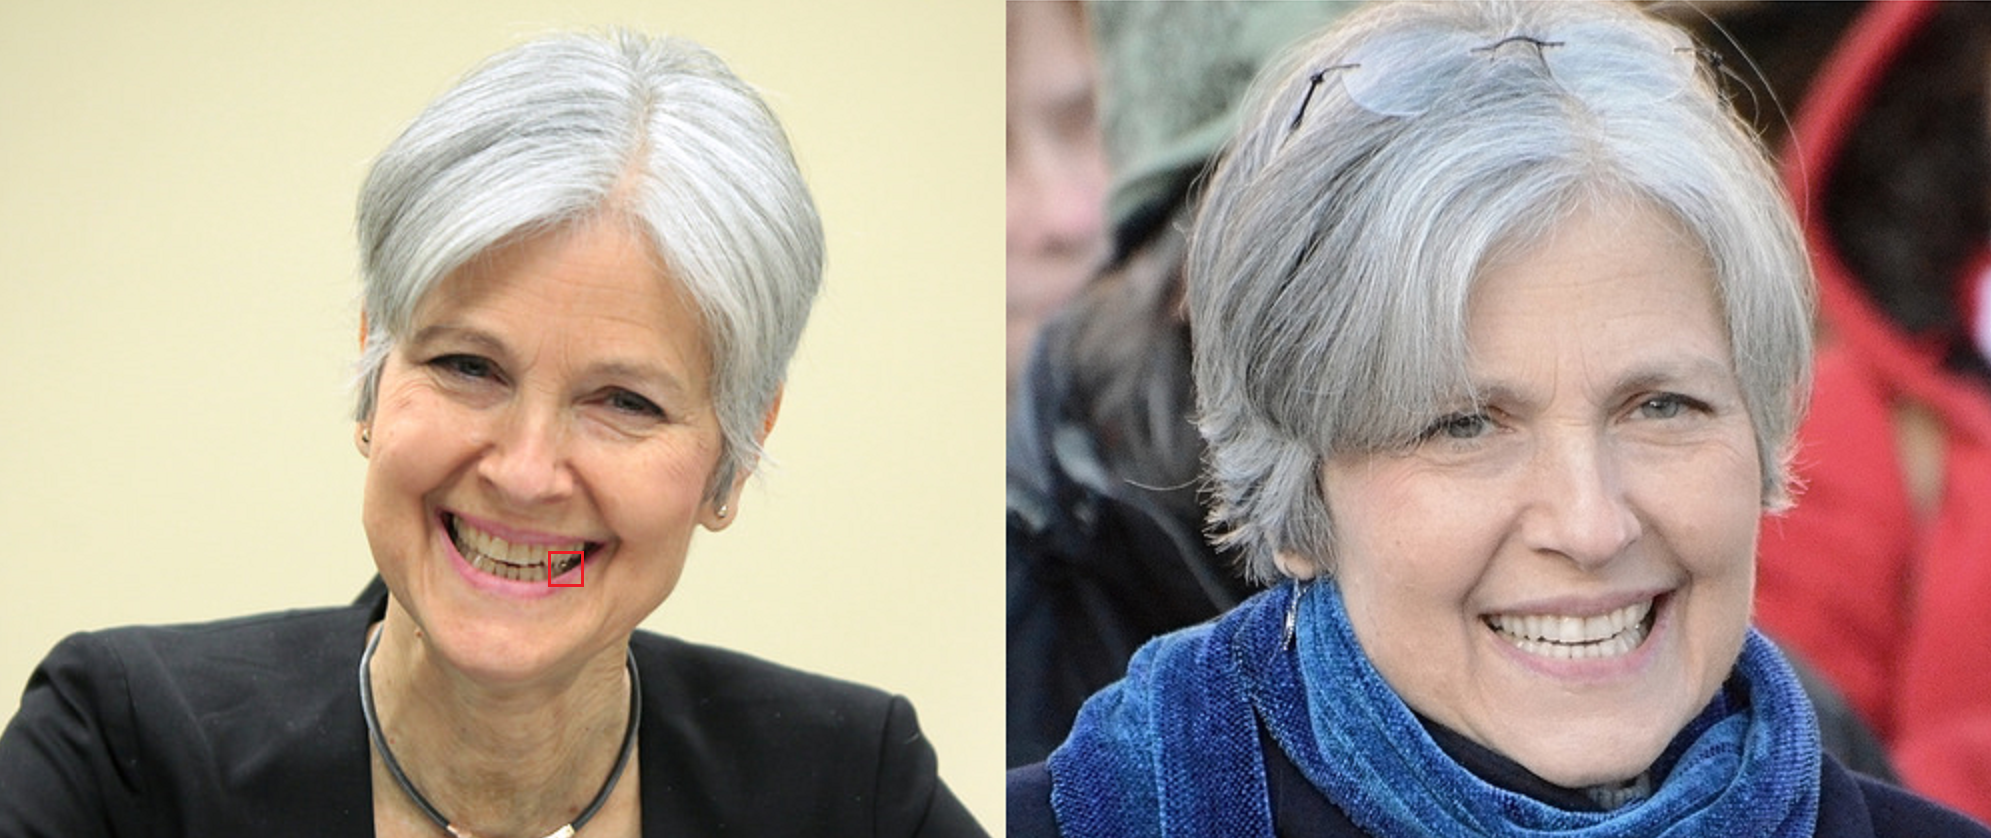 Image of Jill Stein highlighting dental work